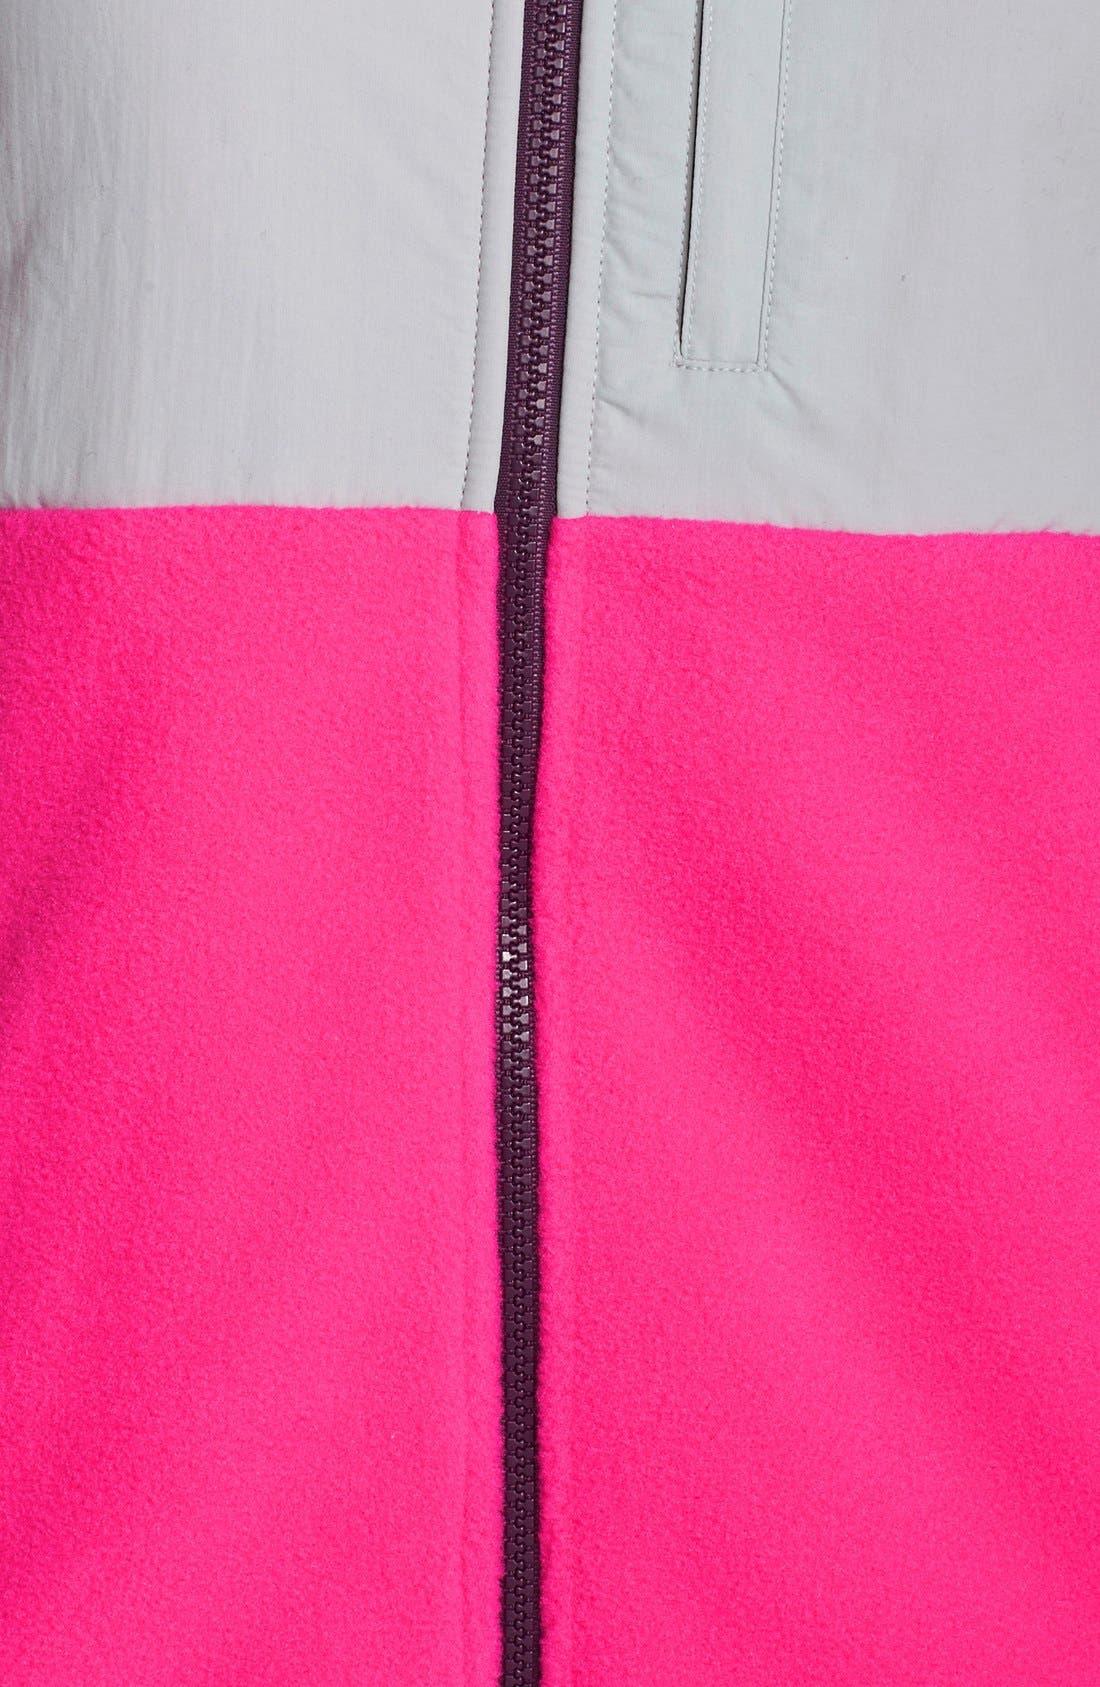 Alternate Image 3  - The North Face 'Denali' Jacket